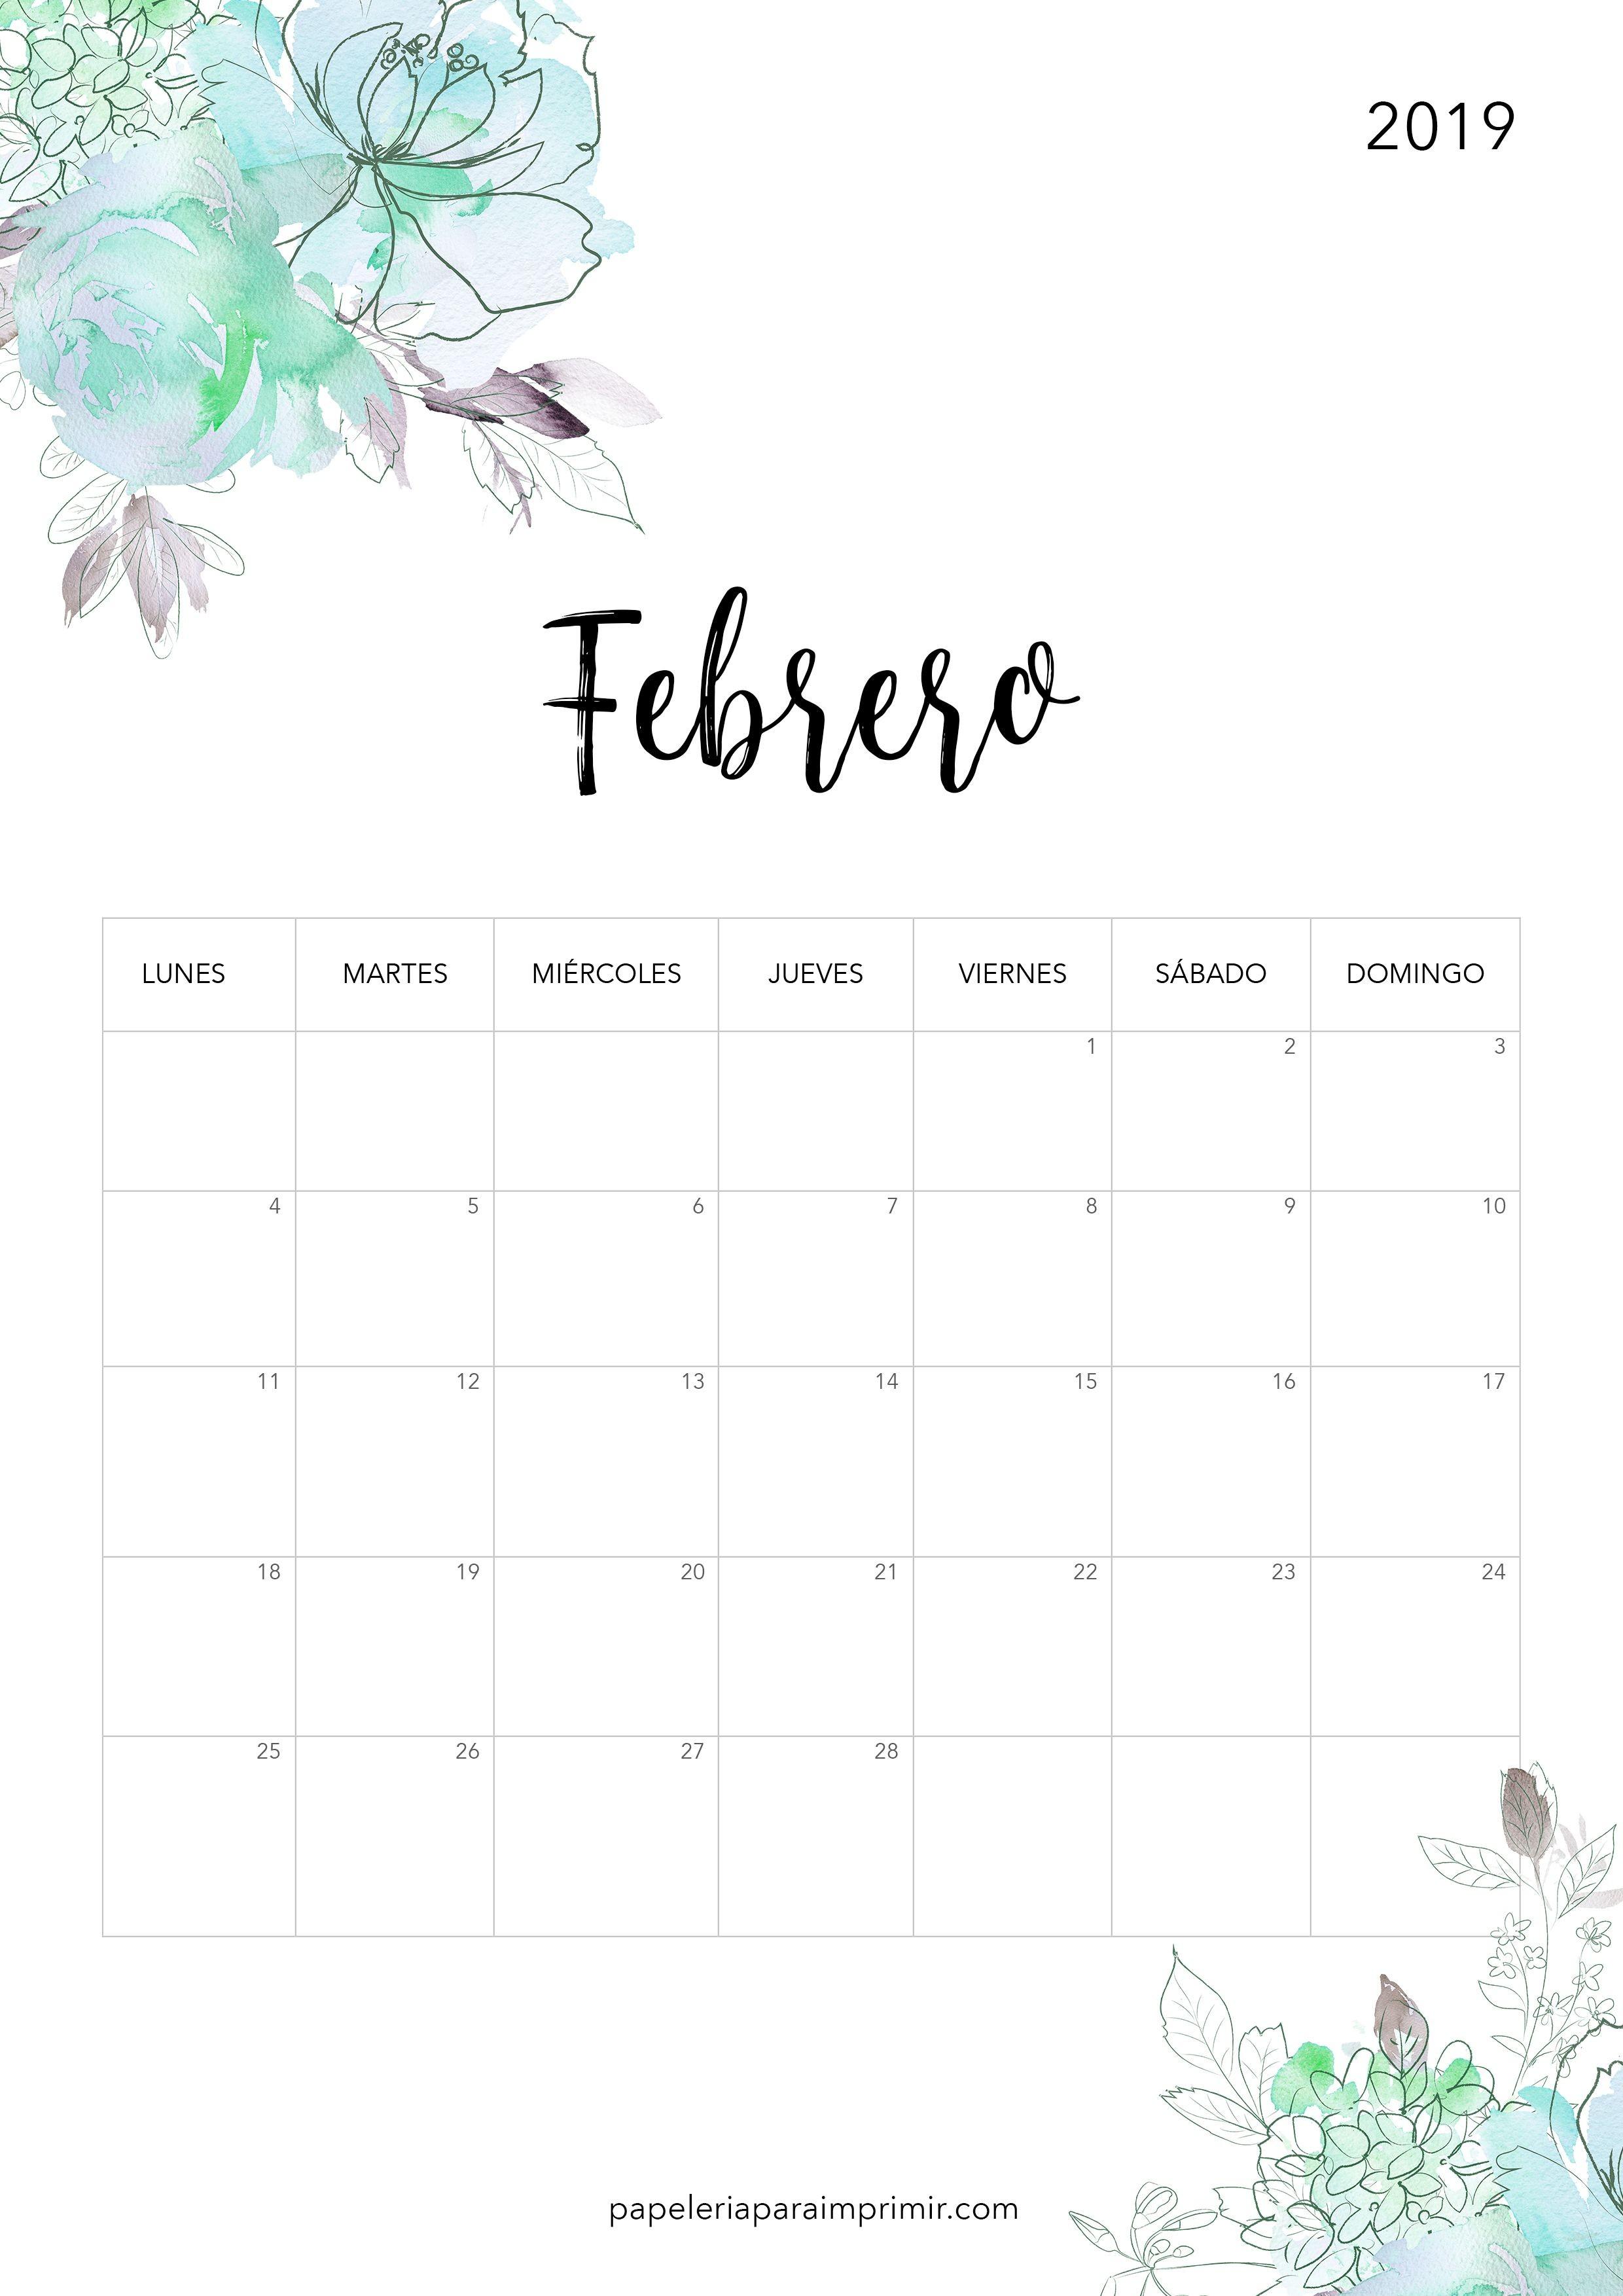 Calendario para imprimir 2019 Febrero calendario imprimir febrero february freebie